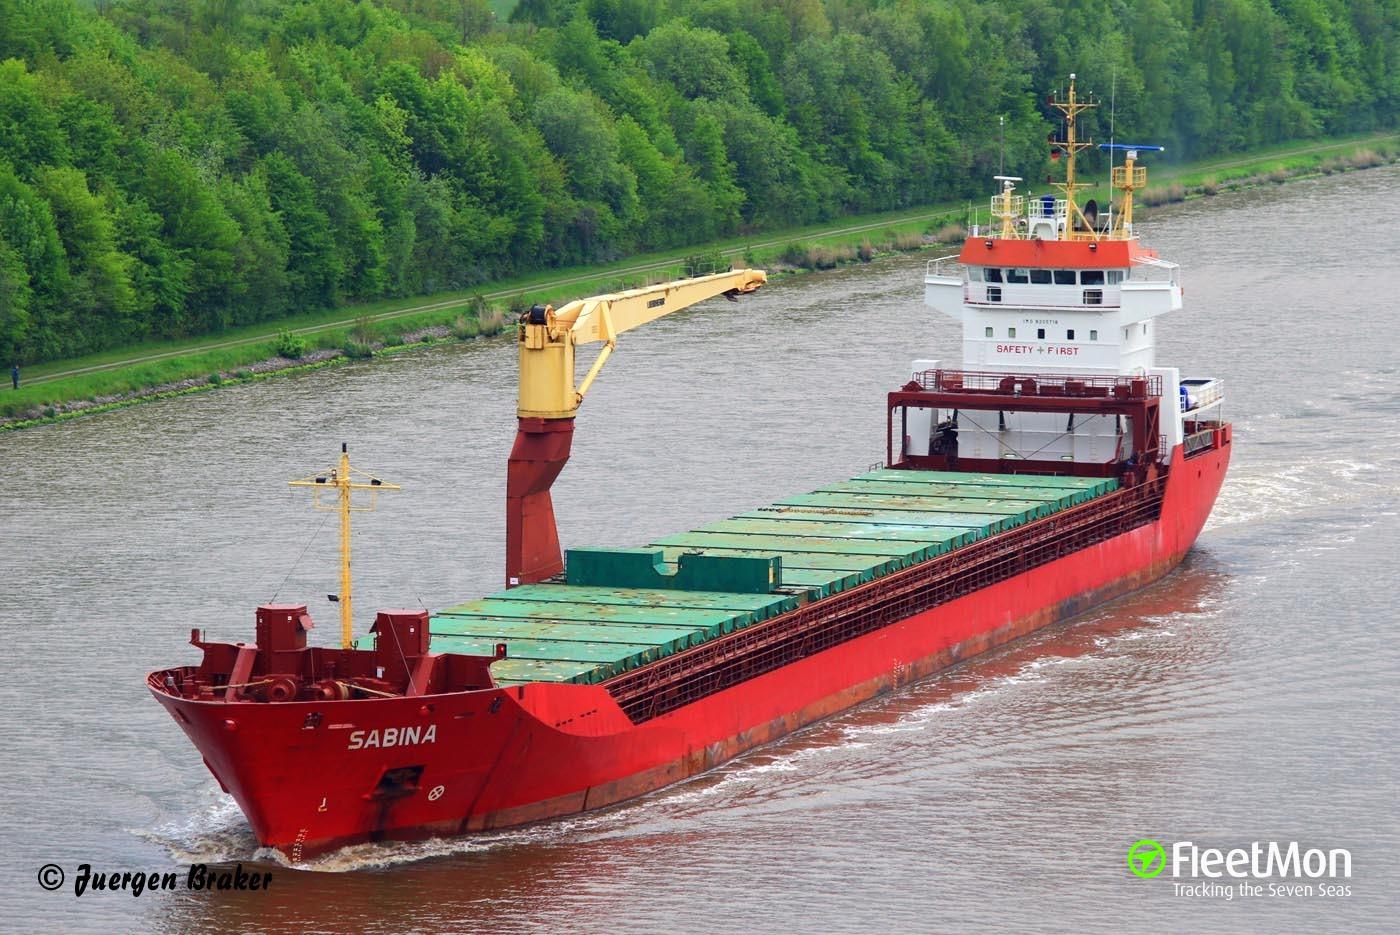 Sabina nearly ran aground on Bornholm coast